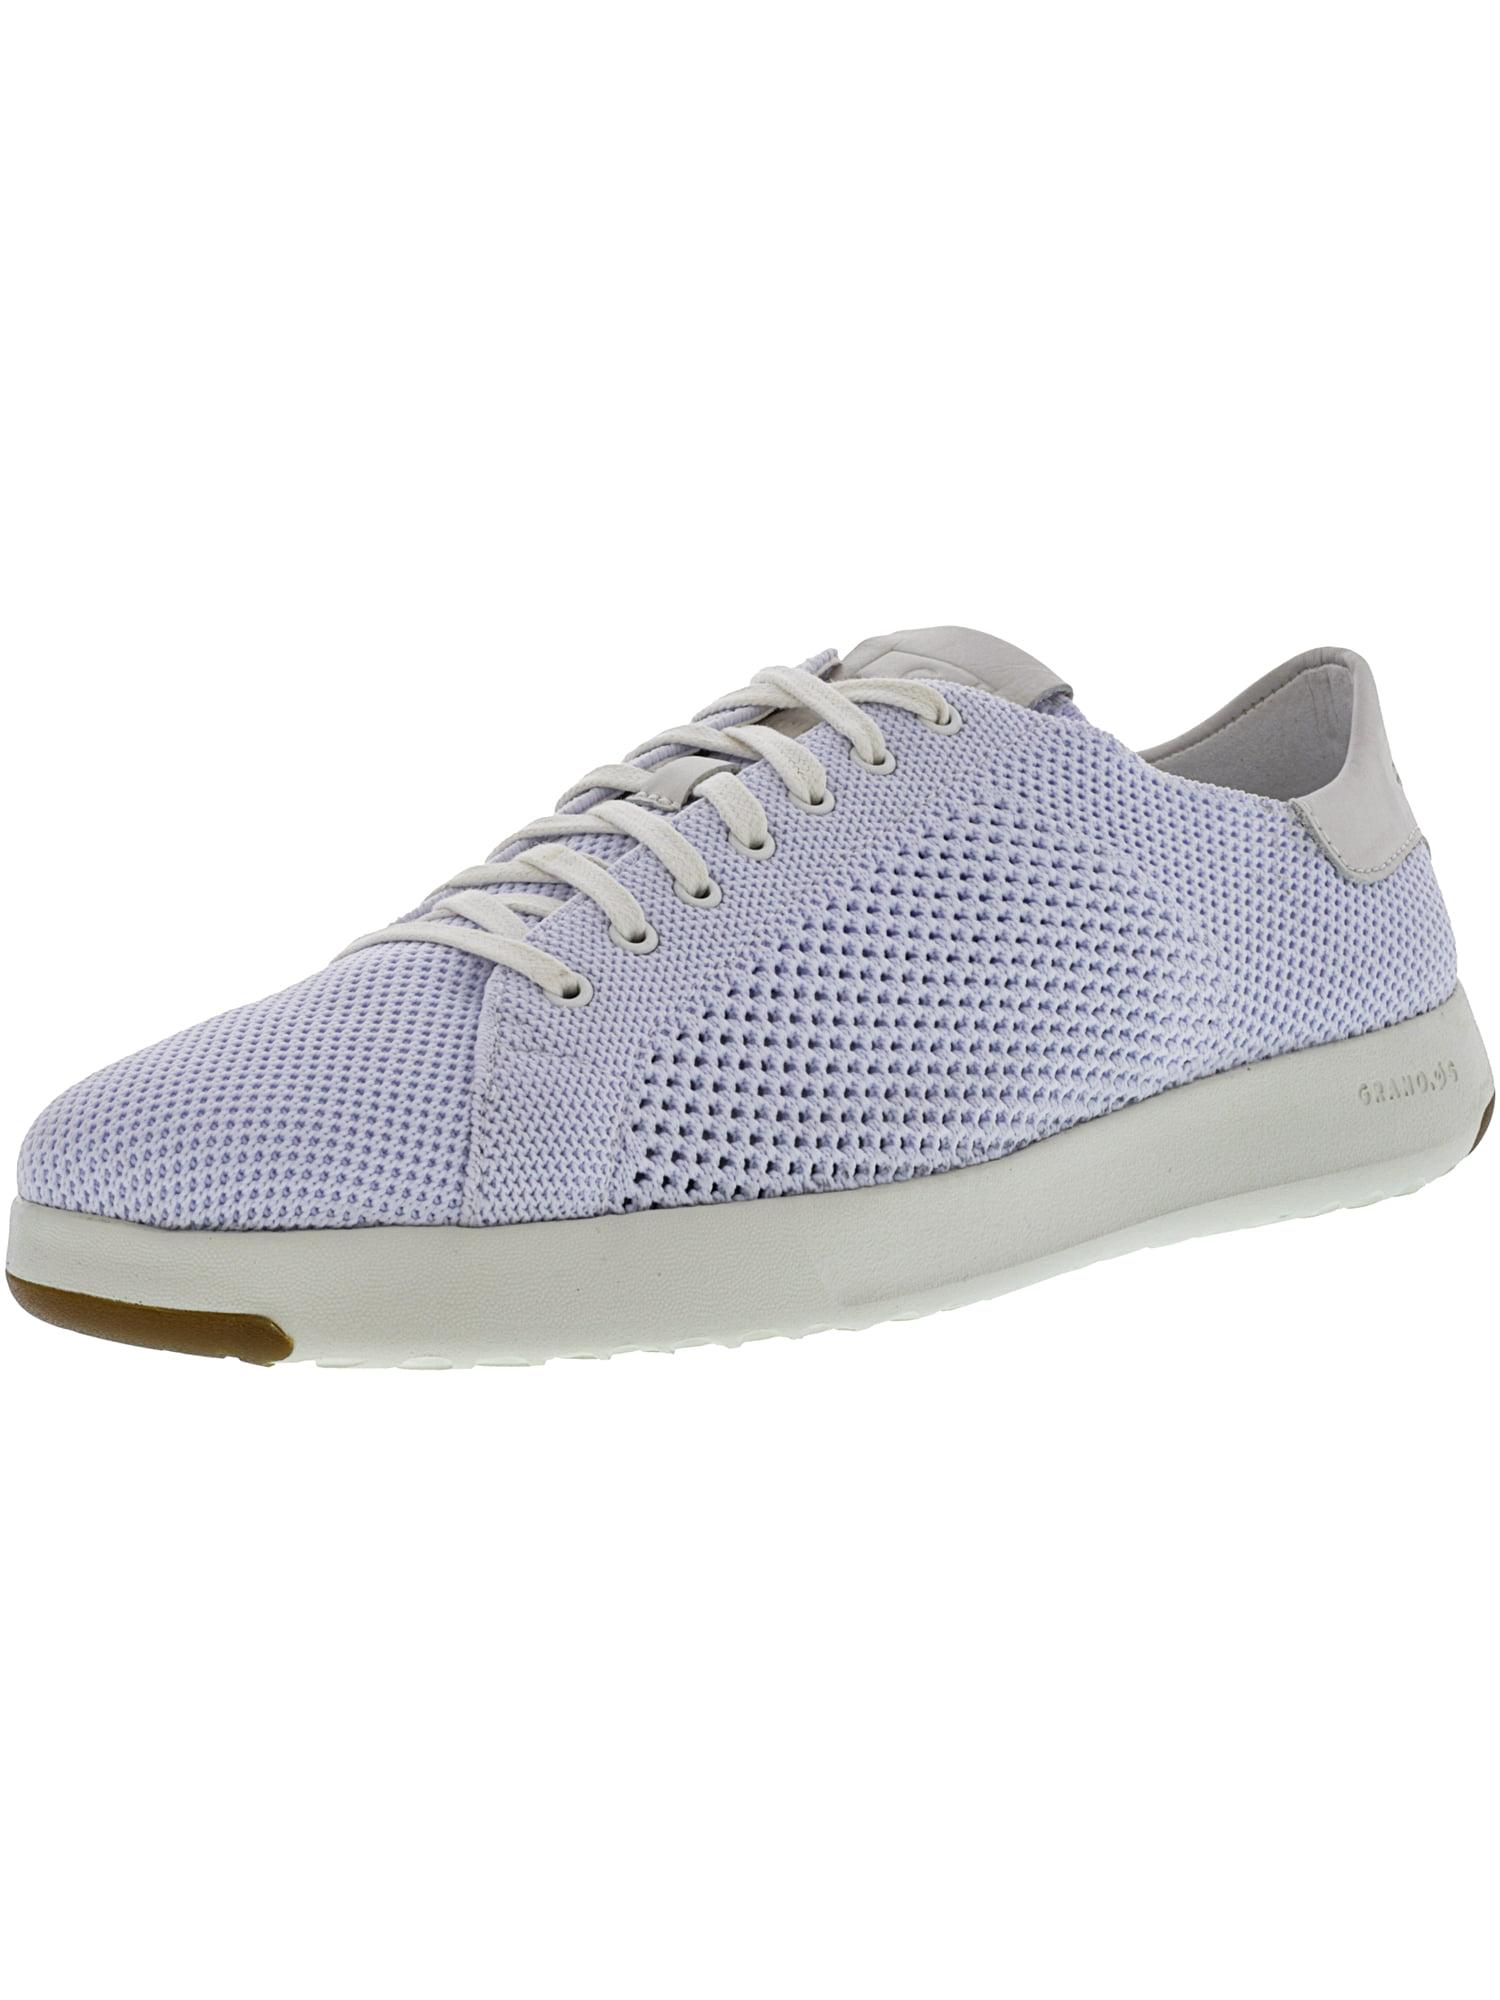 6943d57c4dc2 Cole Haan Men s Grandpro Tennis Stitchlite Optic White   Ankle-High Fashion  Sneaker - 10M